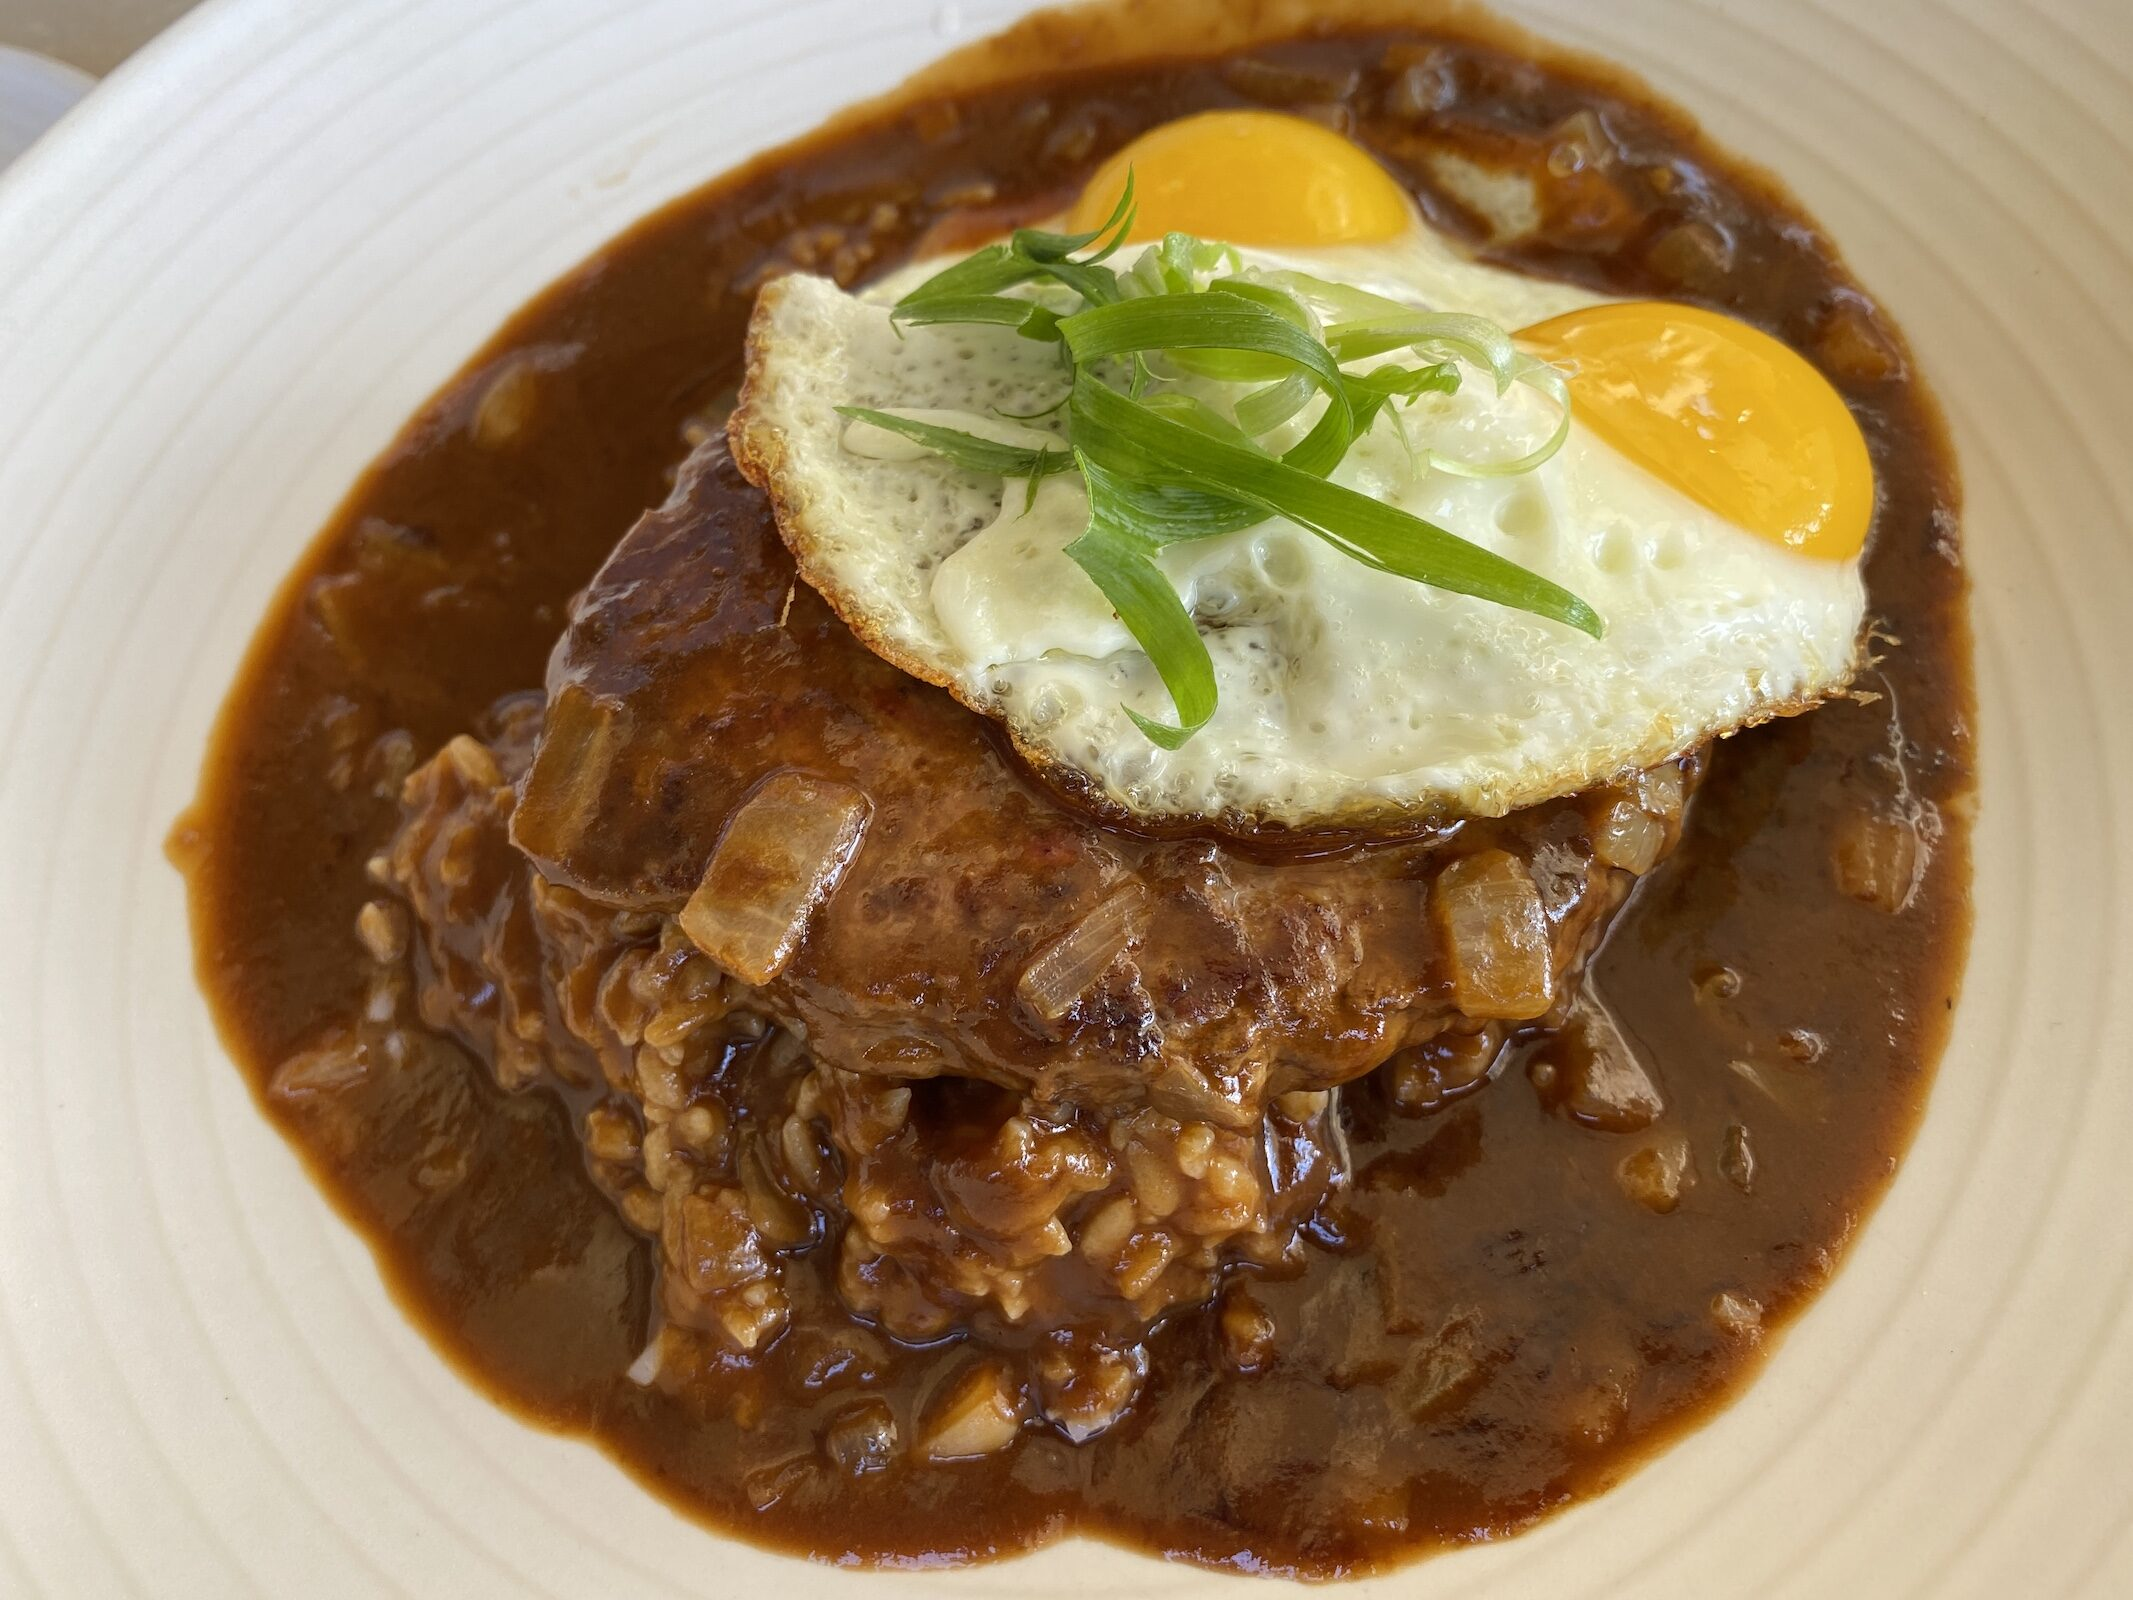 Grand Hyatt Kauai - Breakfast - Loco Moco